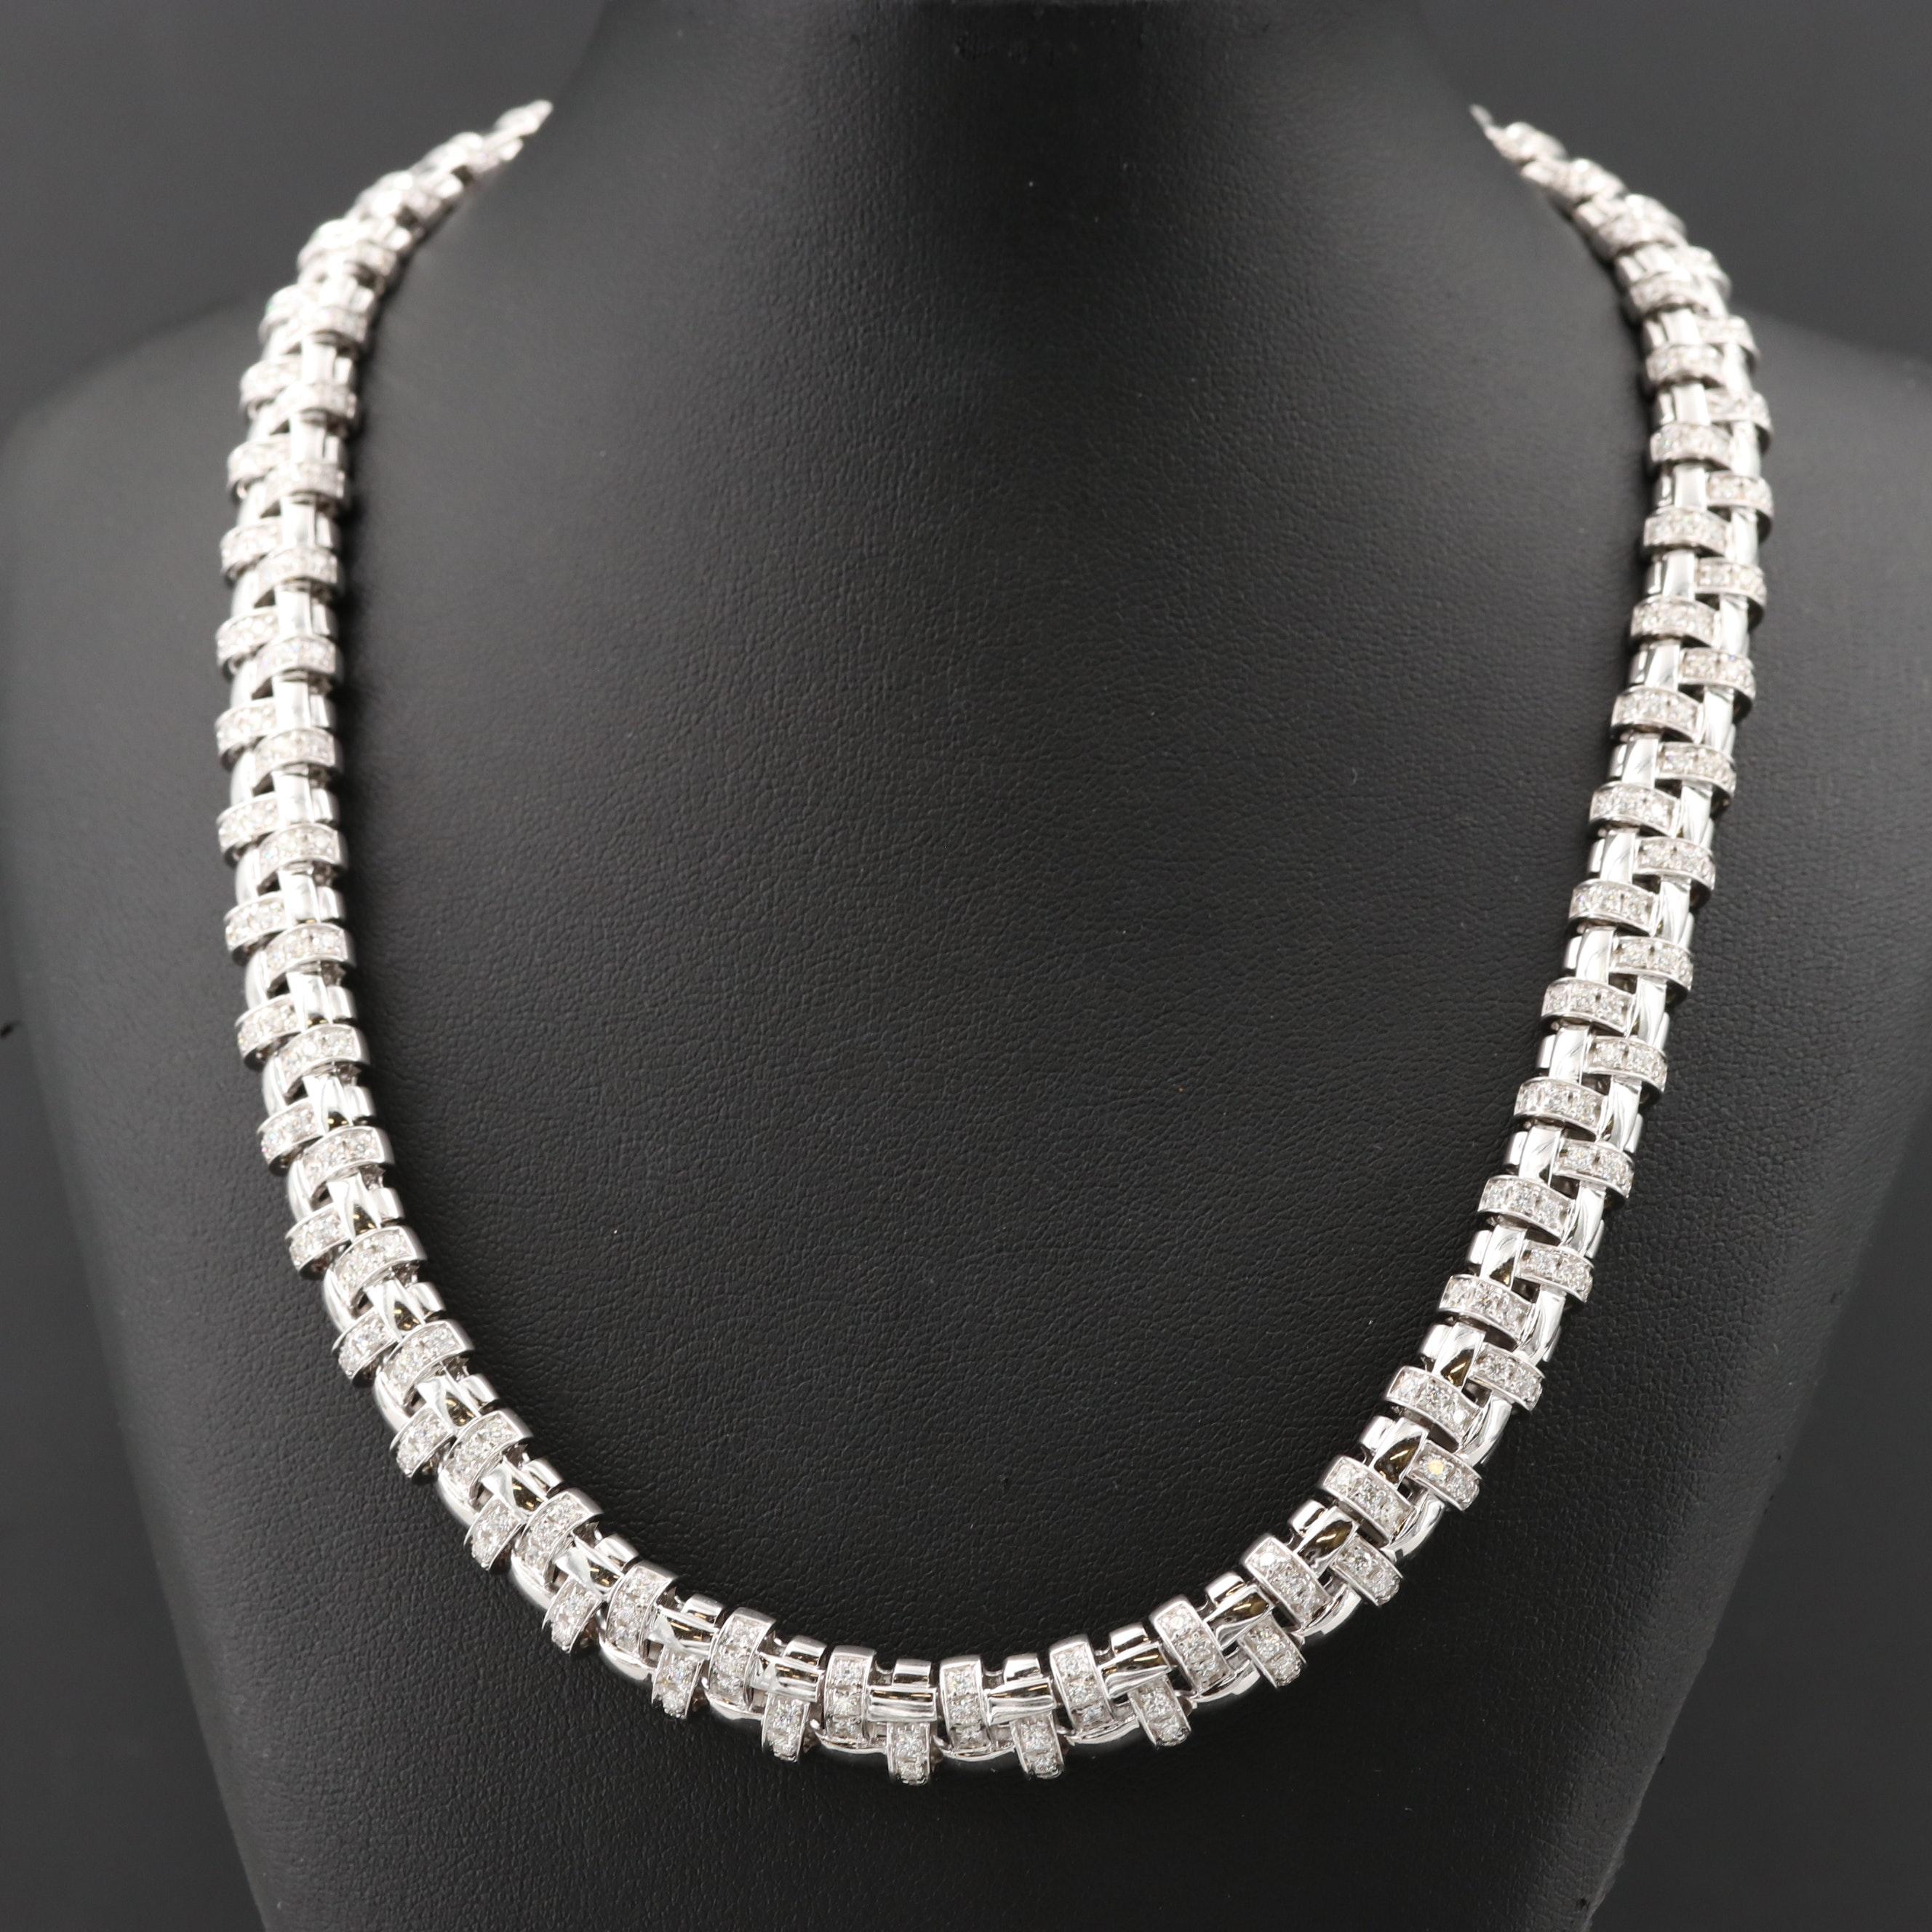 Tiffany & Co. 18K White Gold 6.24 CTW Diamond Basket Weave Necklace